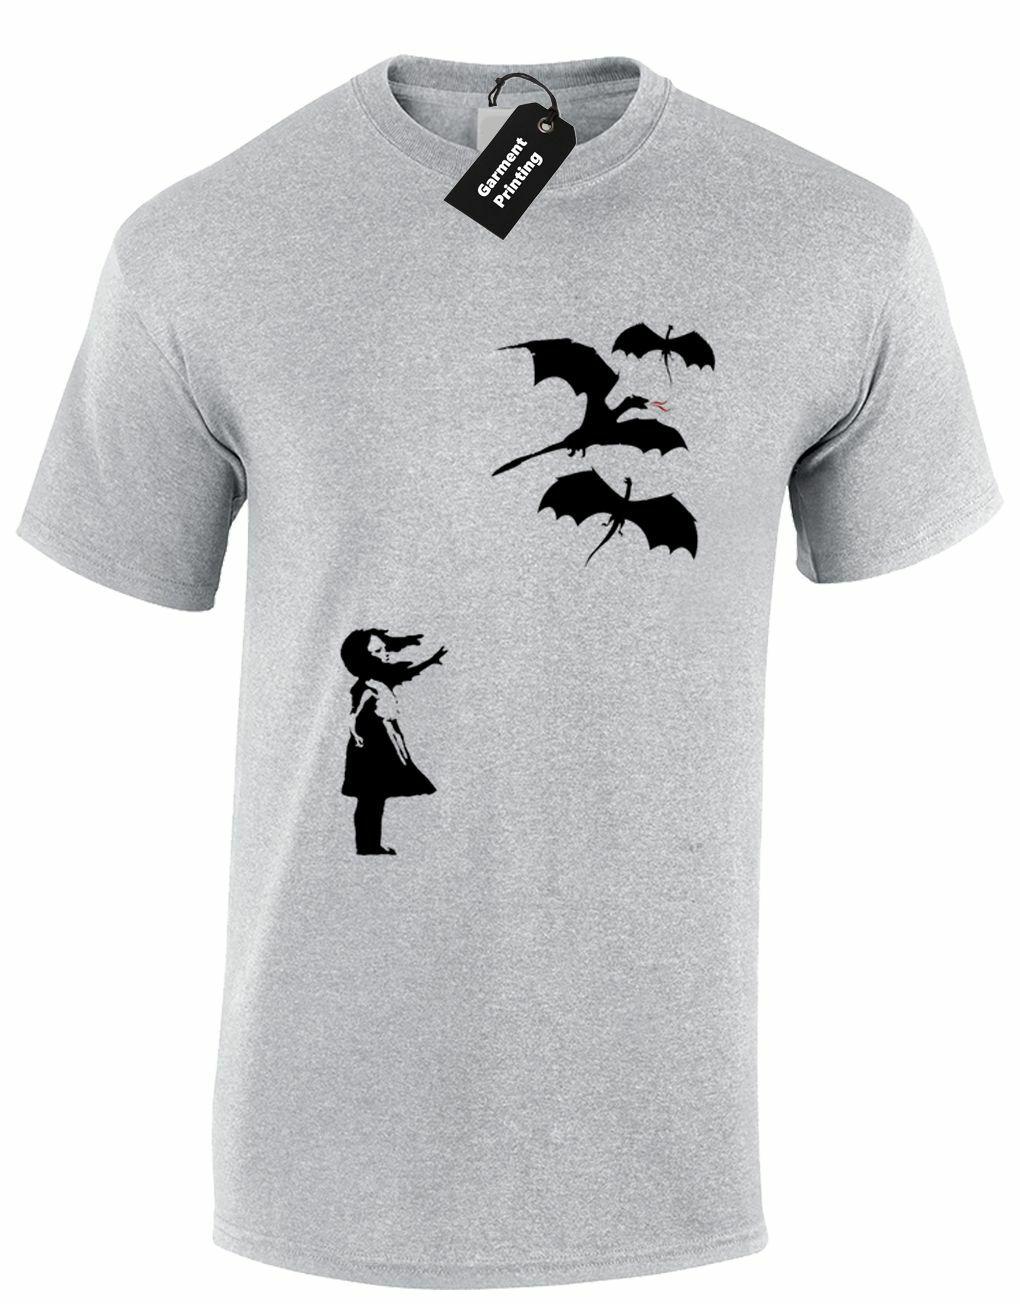 DRAGON BANKSY hommes t-shirt COOL drôle jeu de TYRION DAENERYS trônes JON SNOW 2019 mode t-shirt, Hip Hop t-shirt drôle